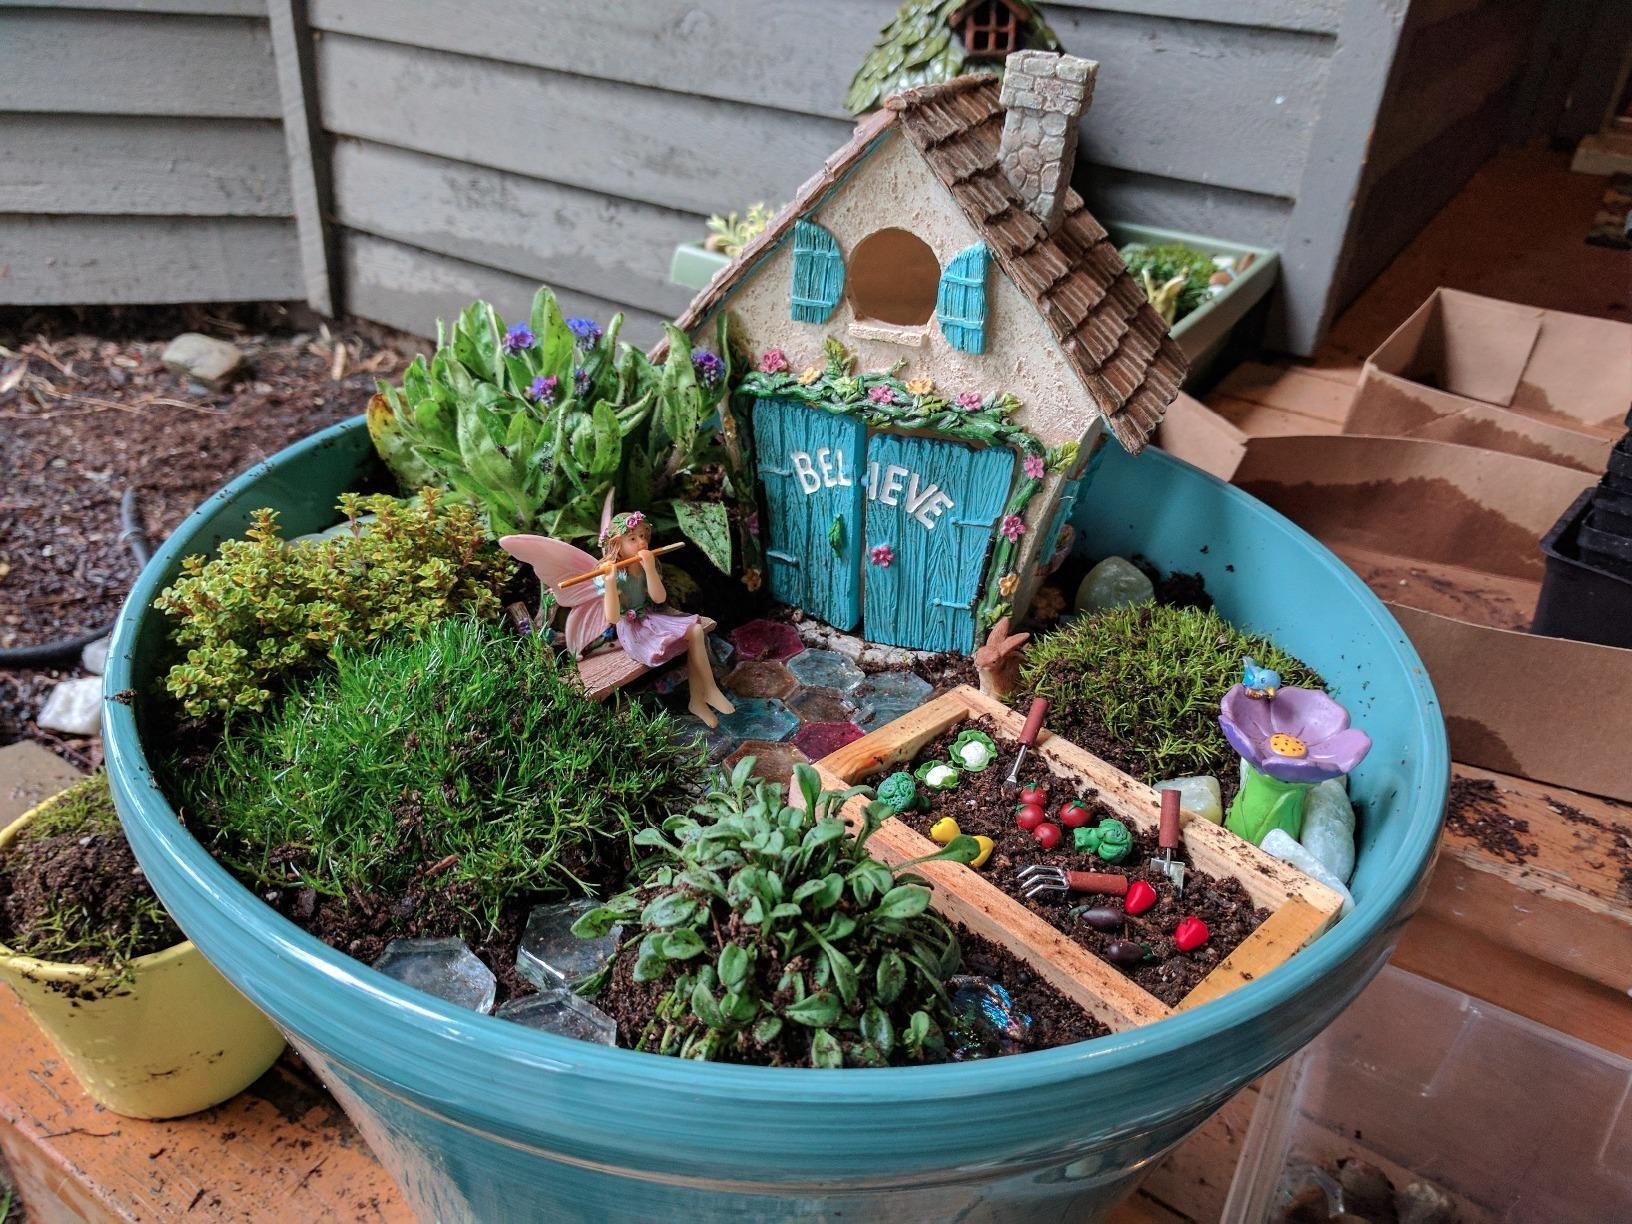 Joykick Fairy Garden House Kit Hand Painted with Opening Doors